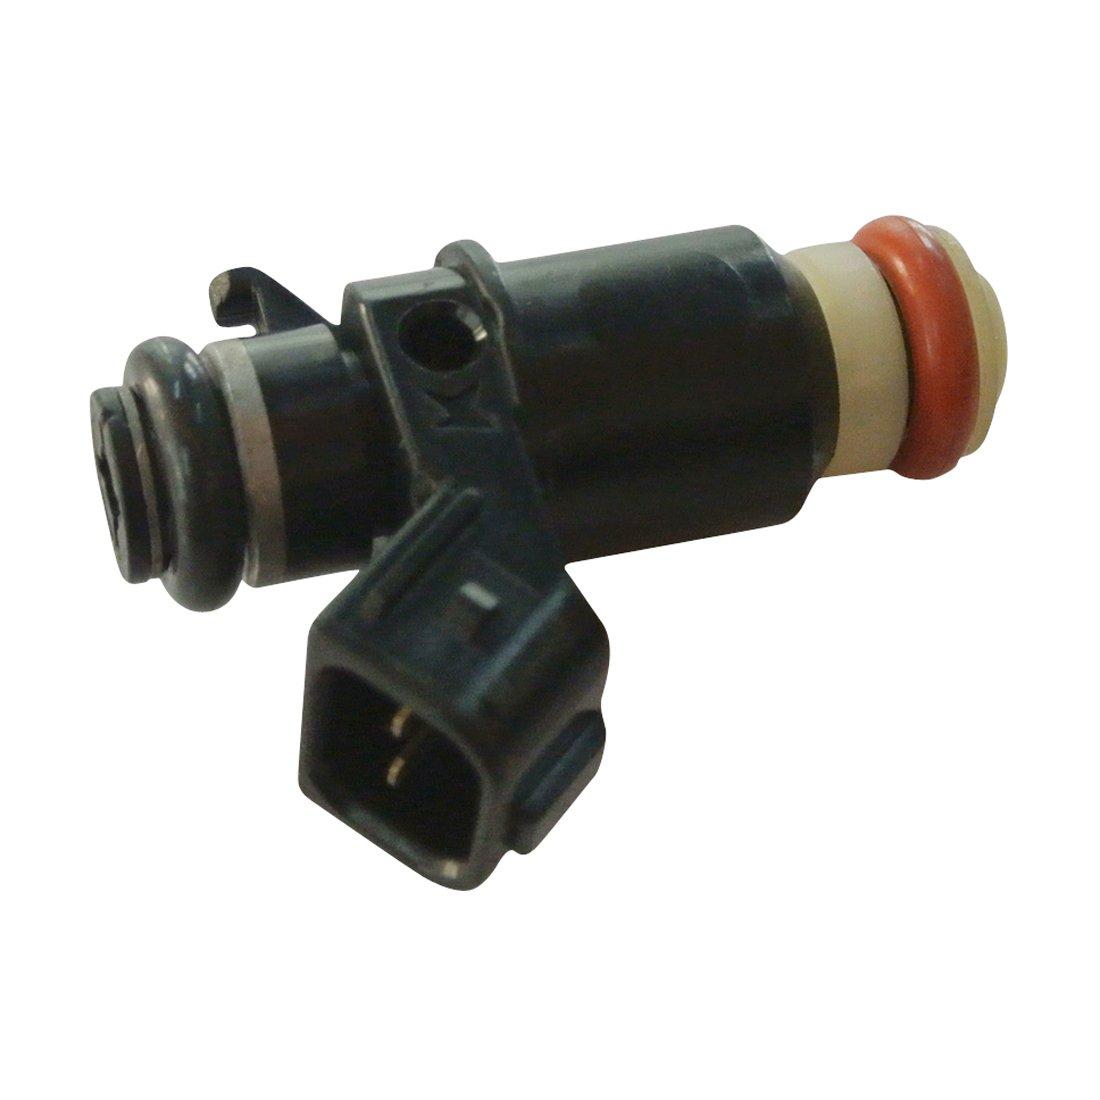 Generic inyector de combustible Pour 2003-2004 Suzuki GSXR1000 BURGMAN 400 1571010G00 15710-10G00 JRL